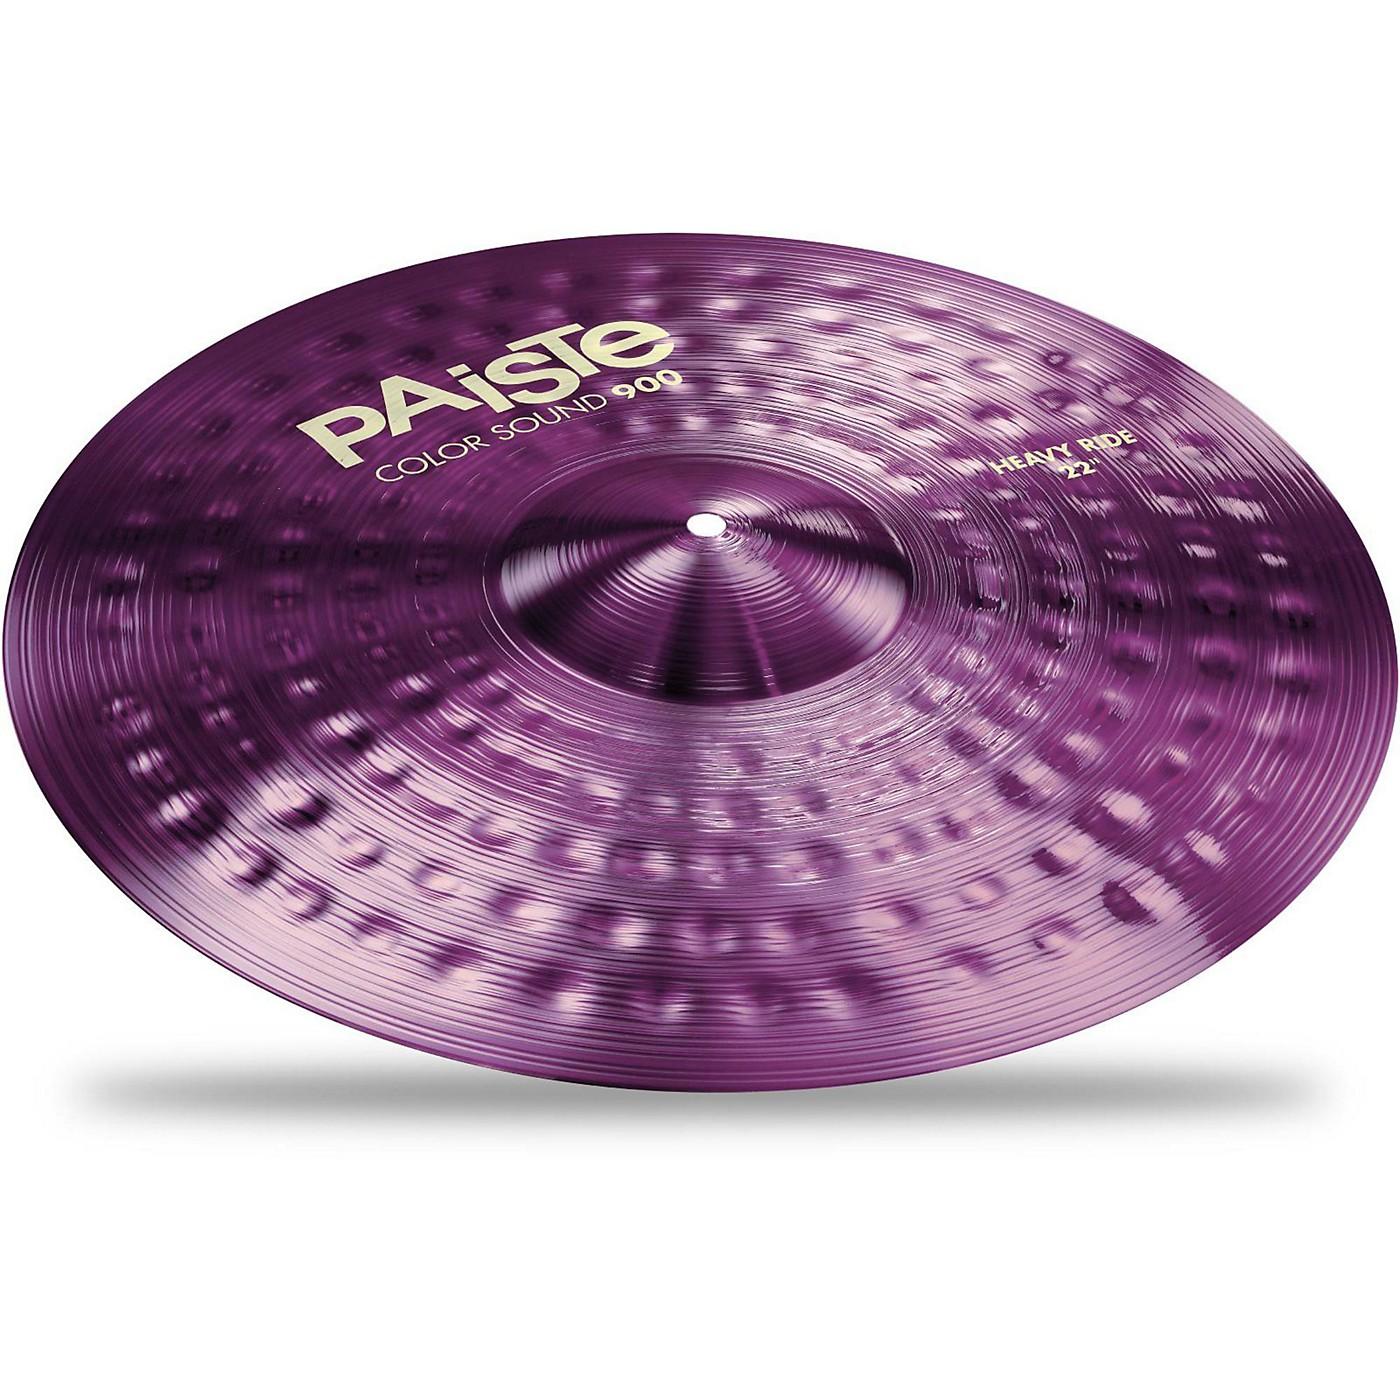 Paiste Colorsound 900 Heavy Ride Cymbal Purple thumbnail